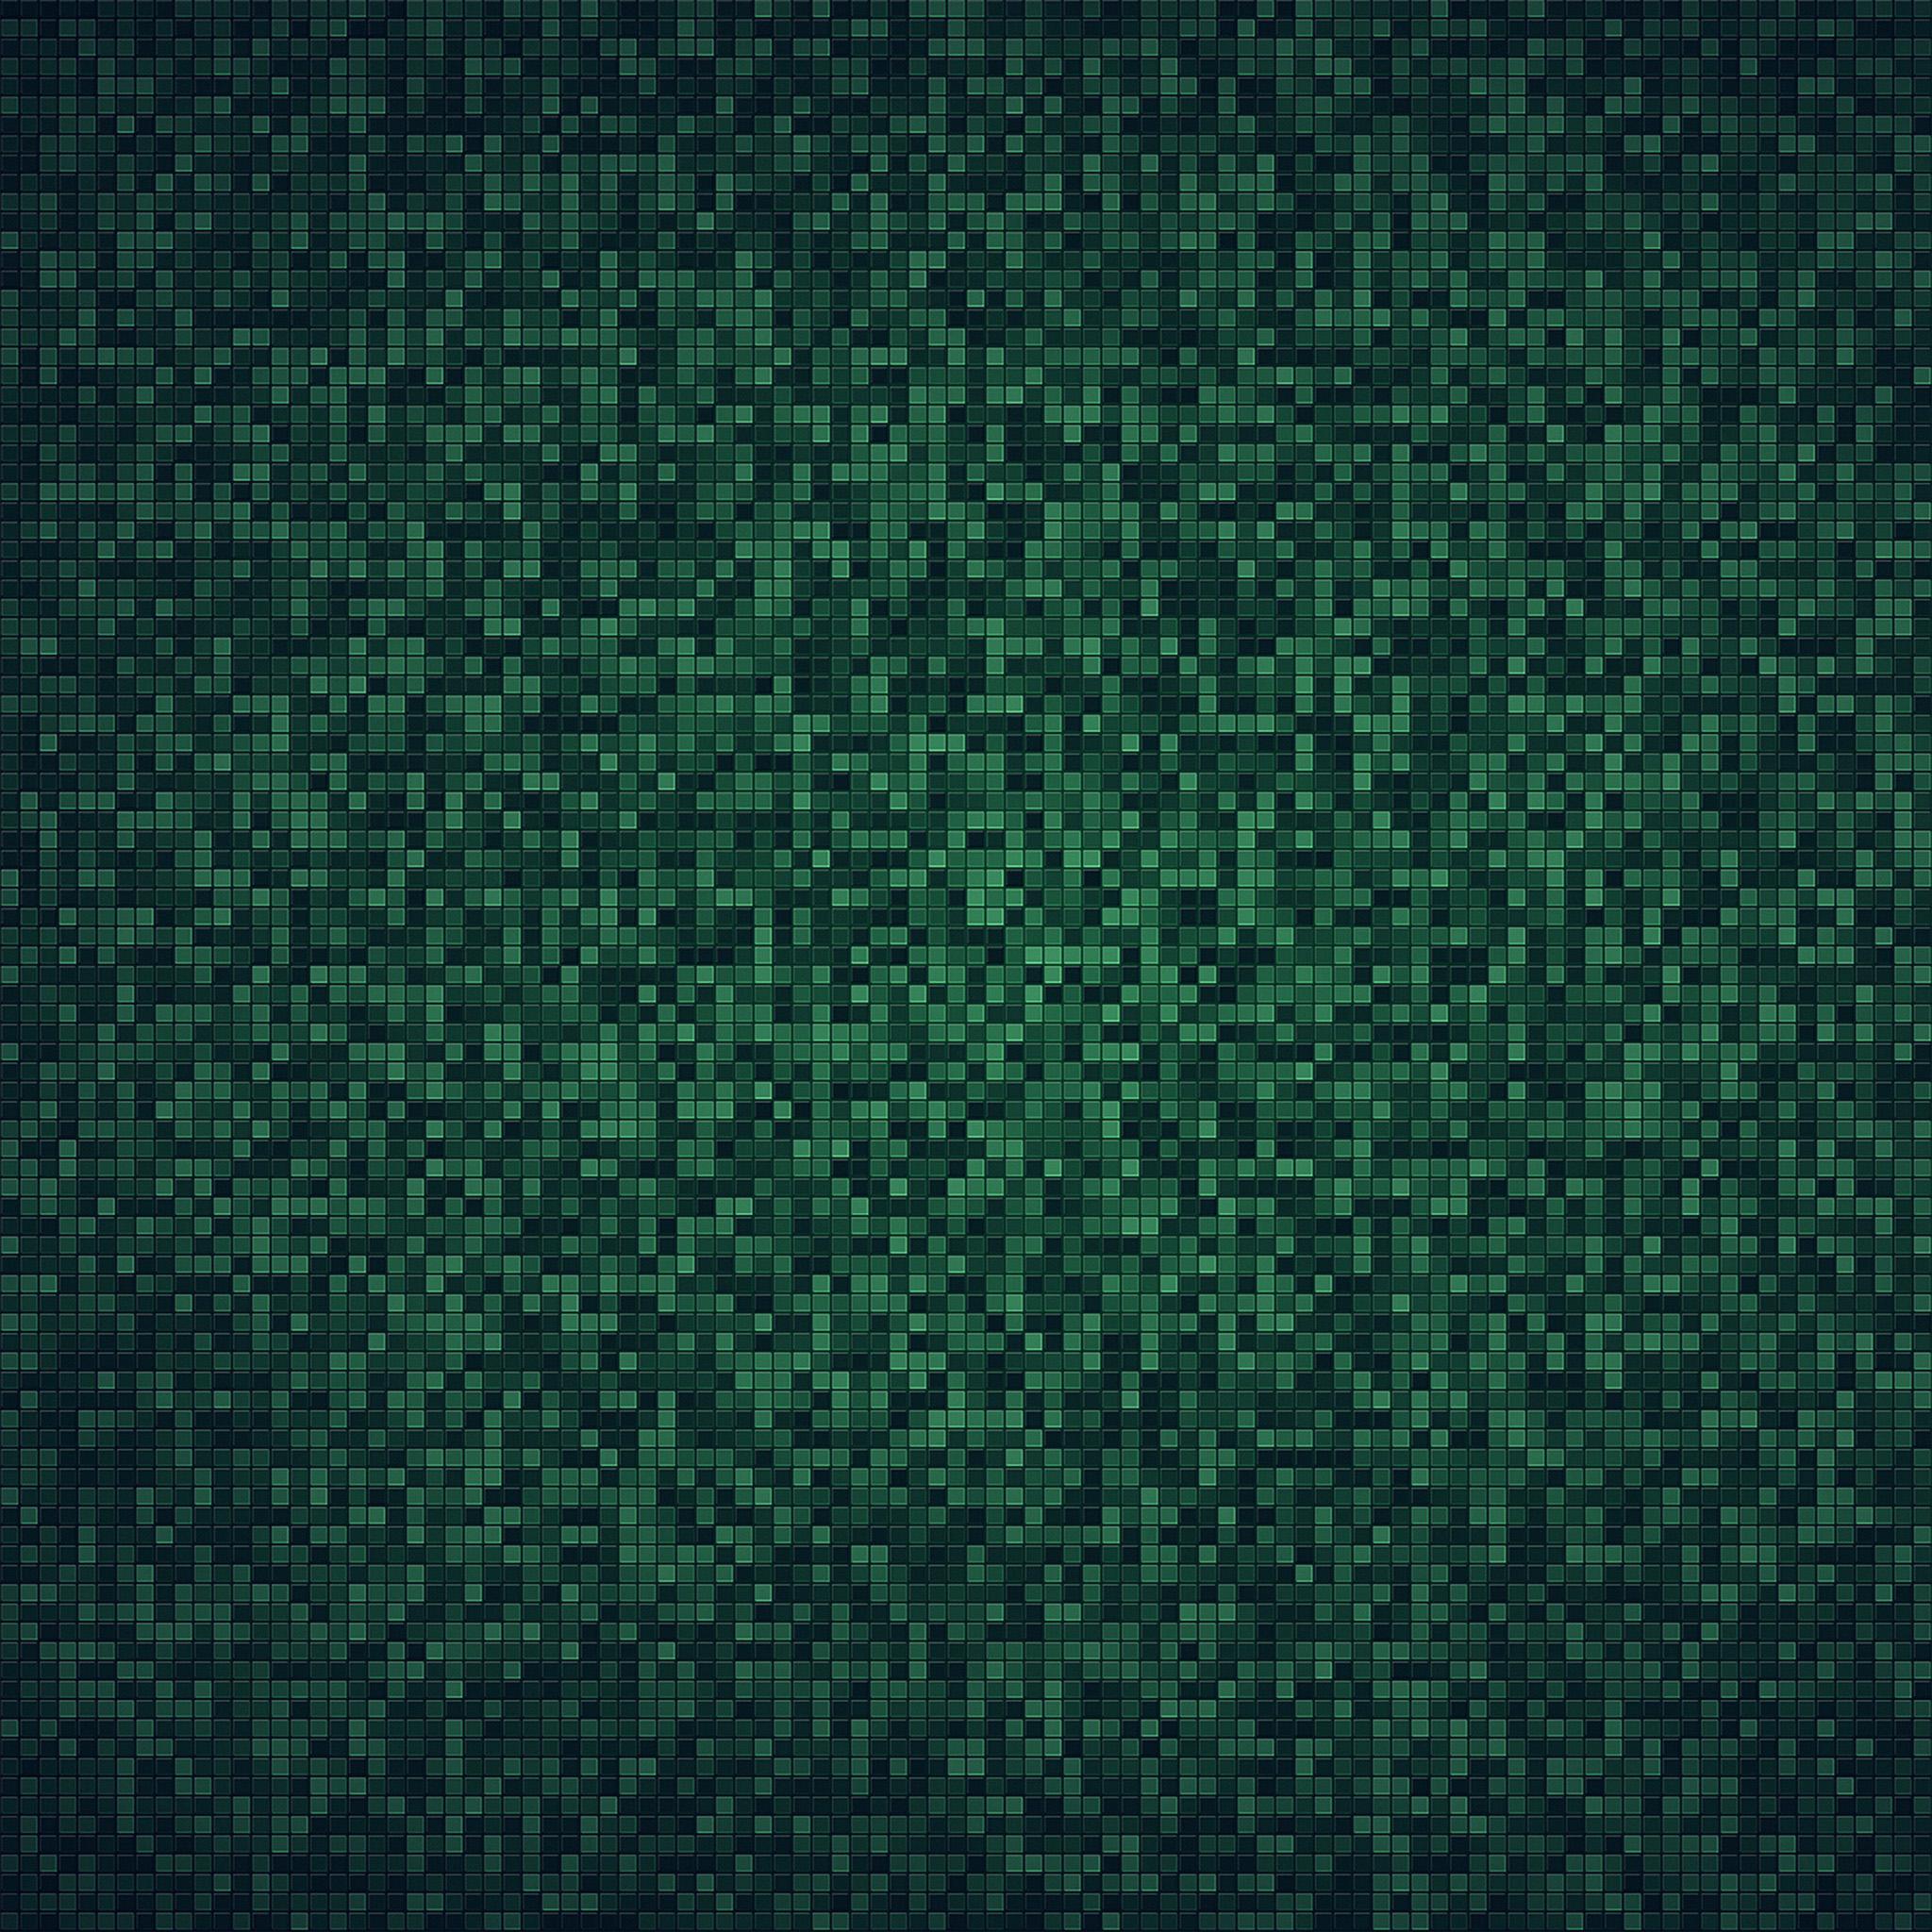 Knitting Wallpaper Iphone : Freeios iphone wallpaper vv grid green mosaic